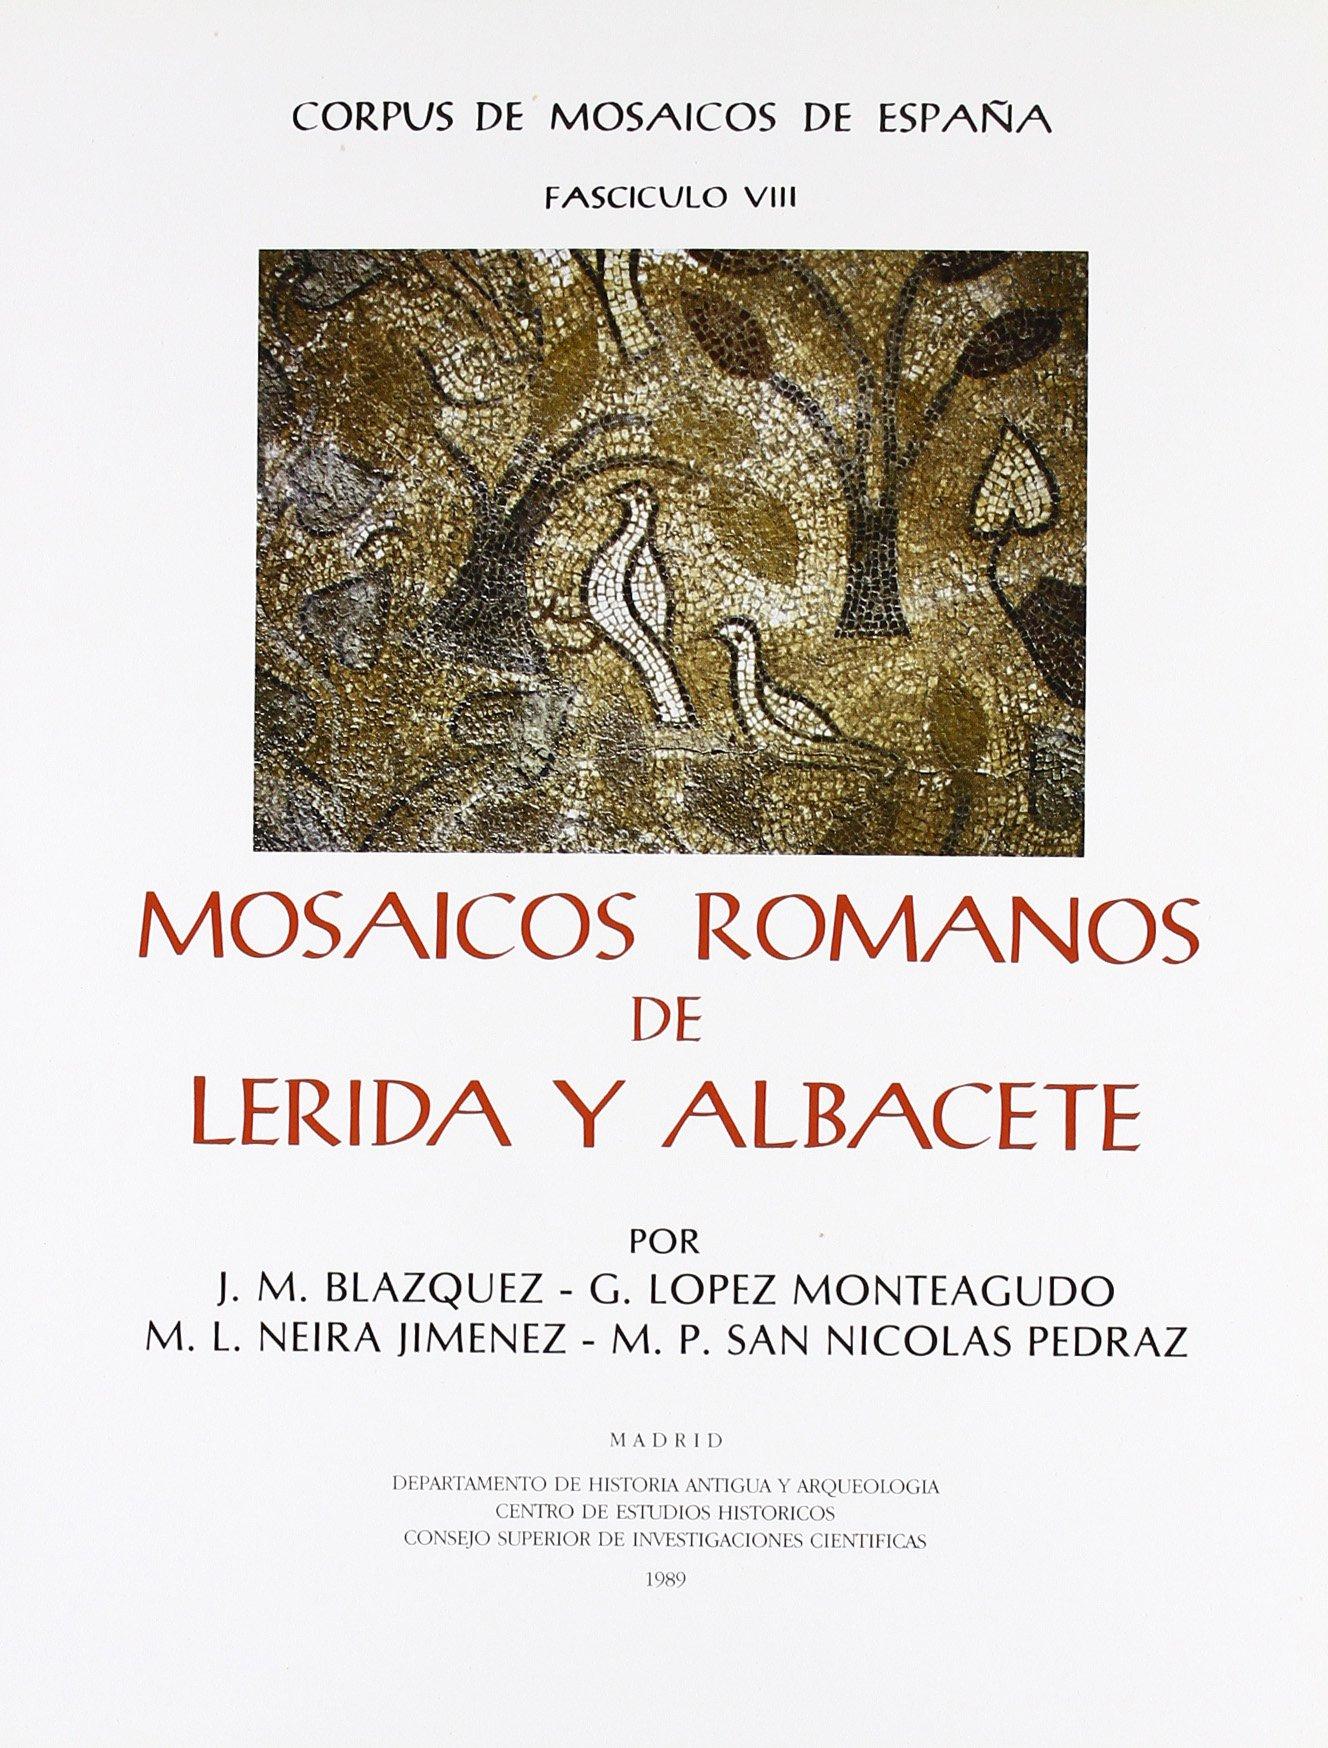 Mosaicos romanos de Lérida y Albacete Corpus de Mosaicos Romanos de España: Amazon.es: Blázquez, José Mª, López Monteagudo, Guadalupe, Neira Jiménez, M. L., San Nicolás Pedraz, Mª Pilar: Libros